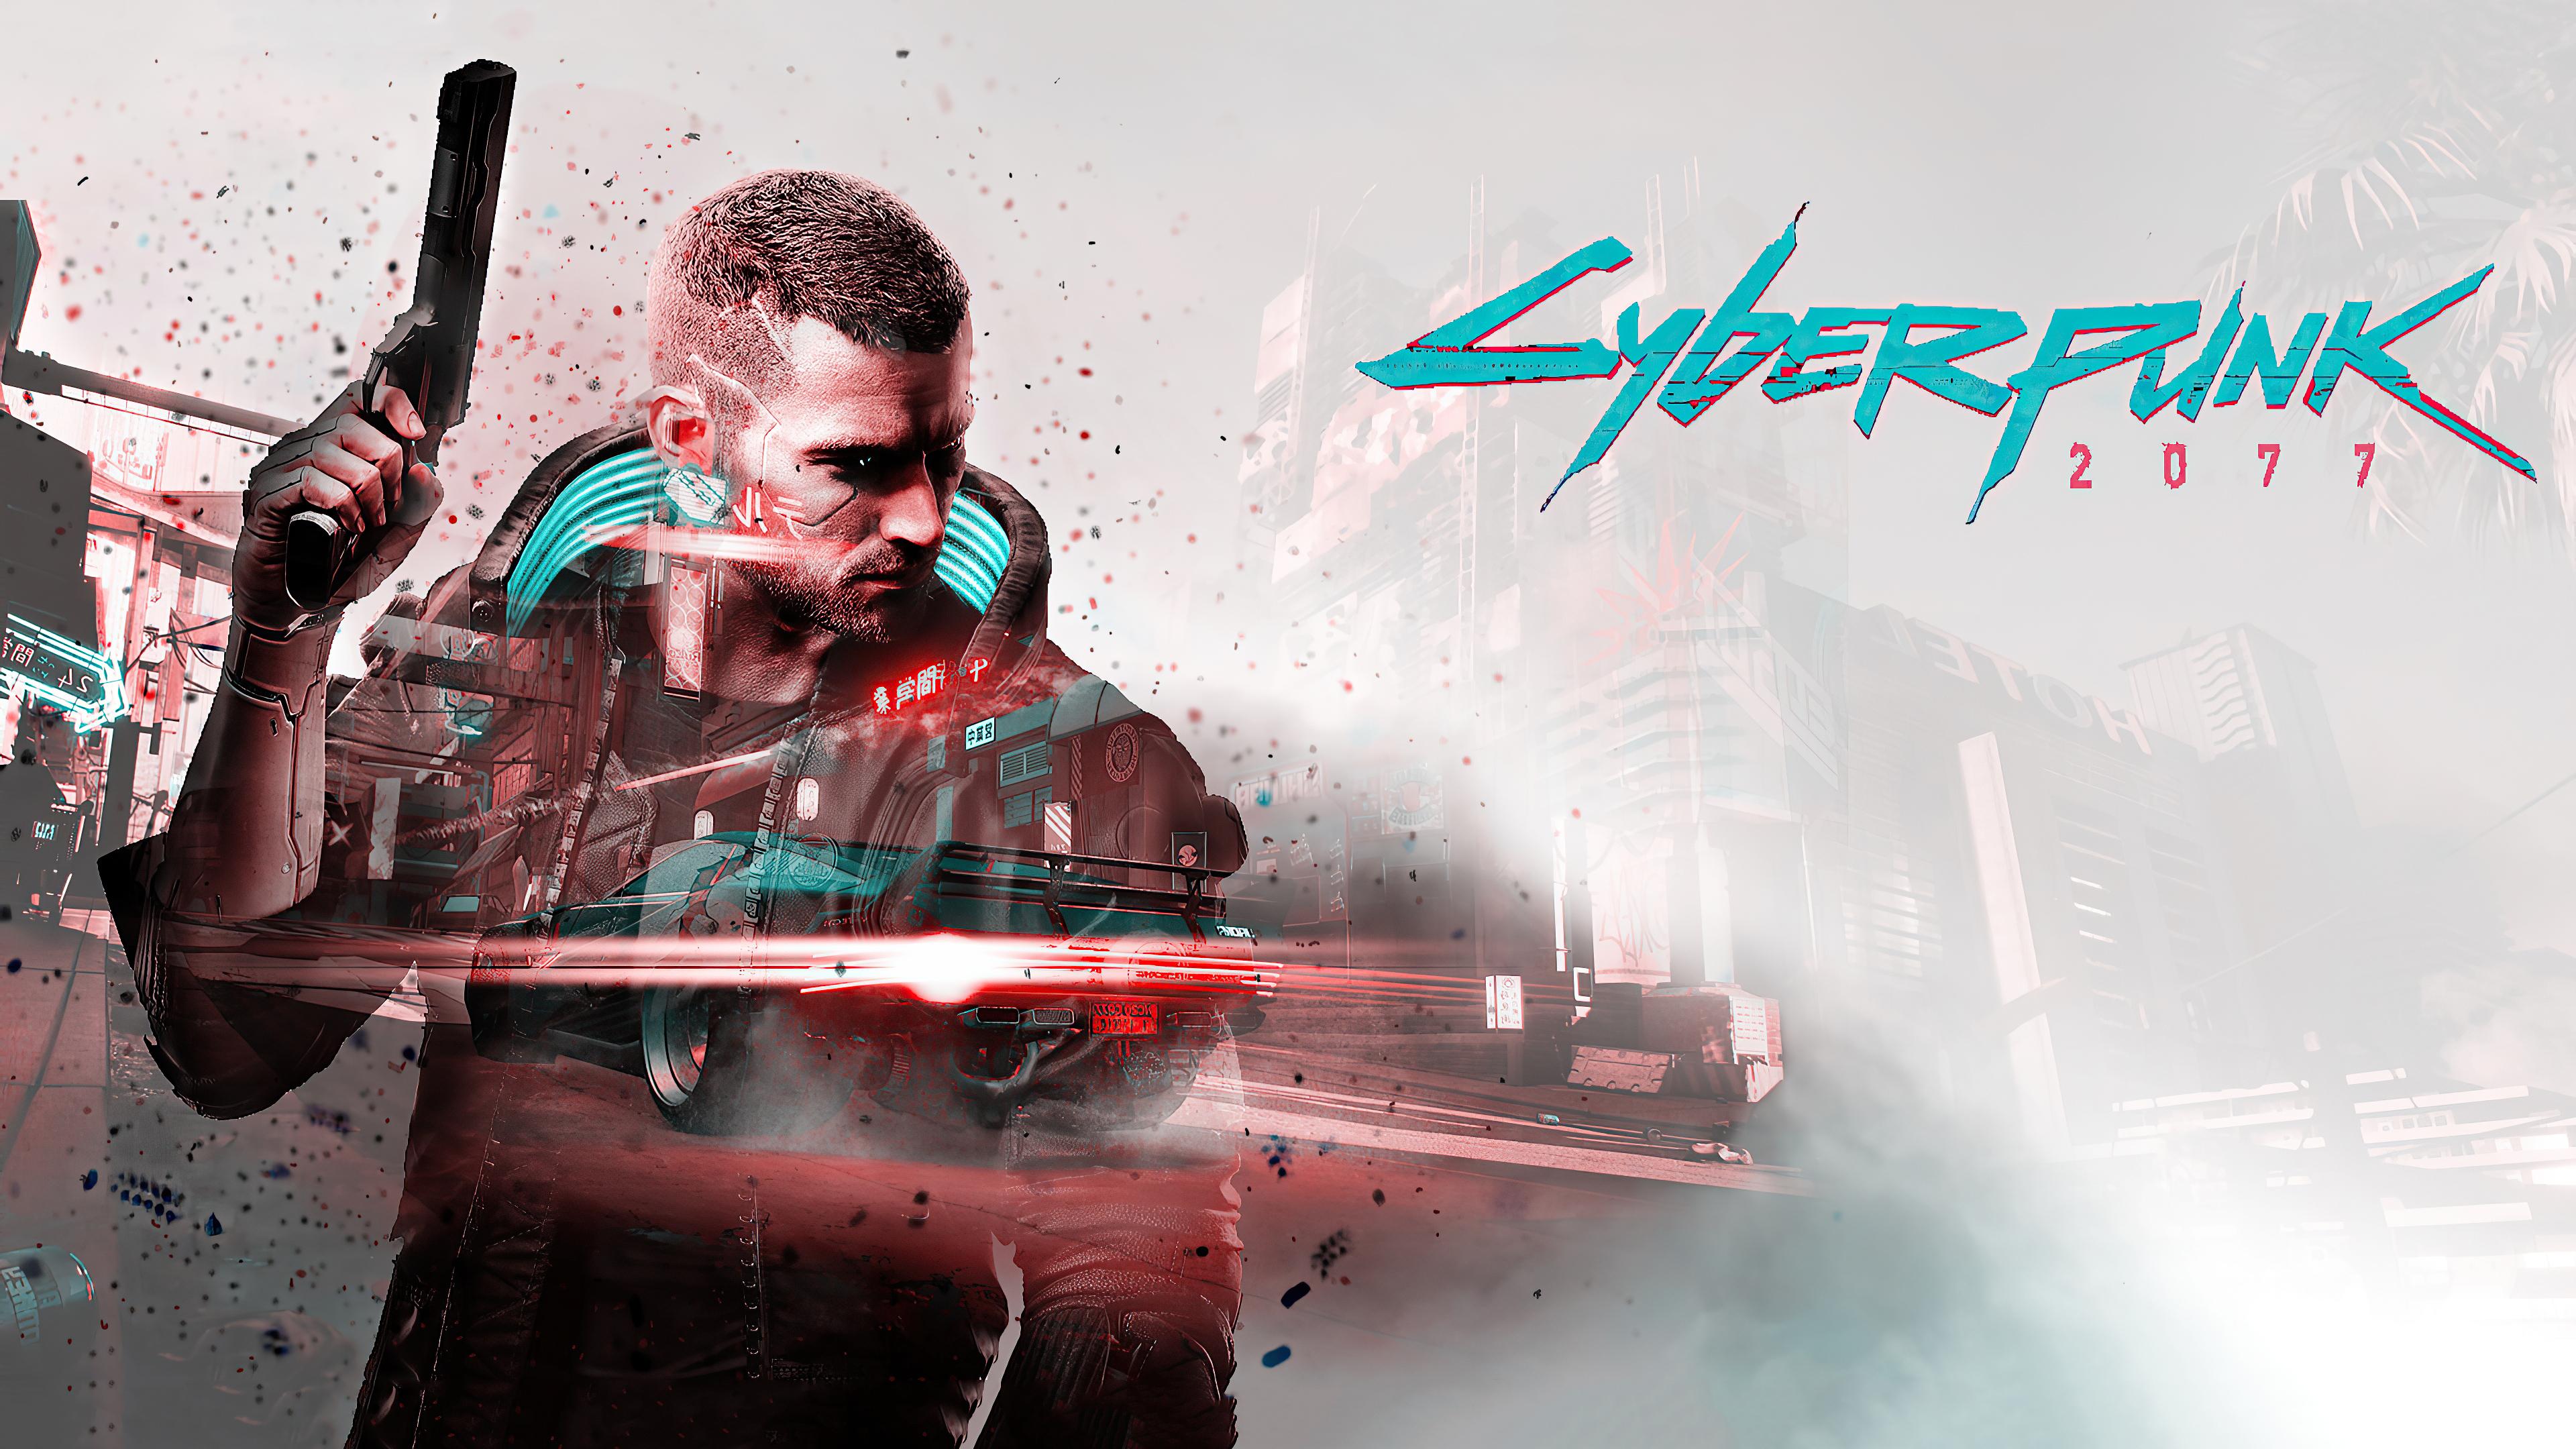 Cyberpunk 2077 2020 4k Cyberpunk 2077 2020 4k wallpapers